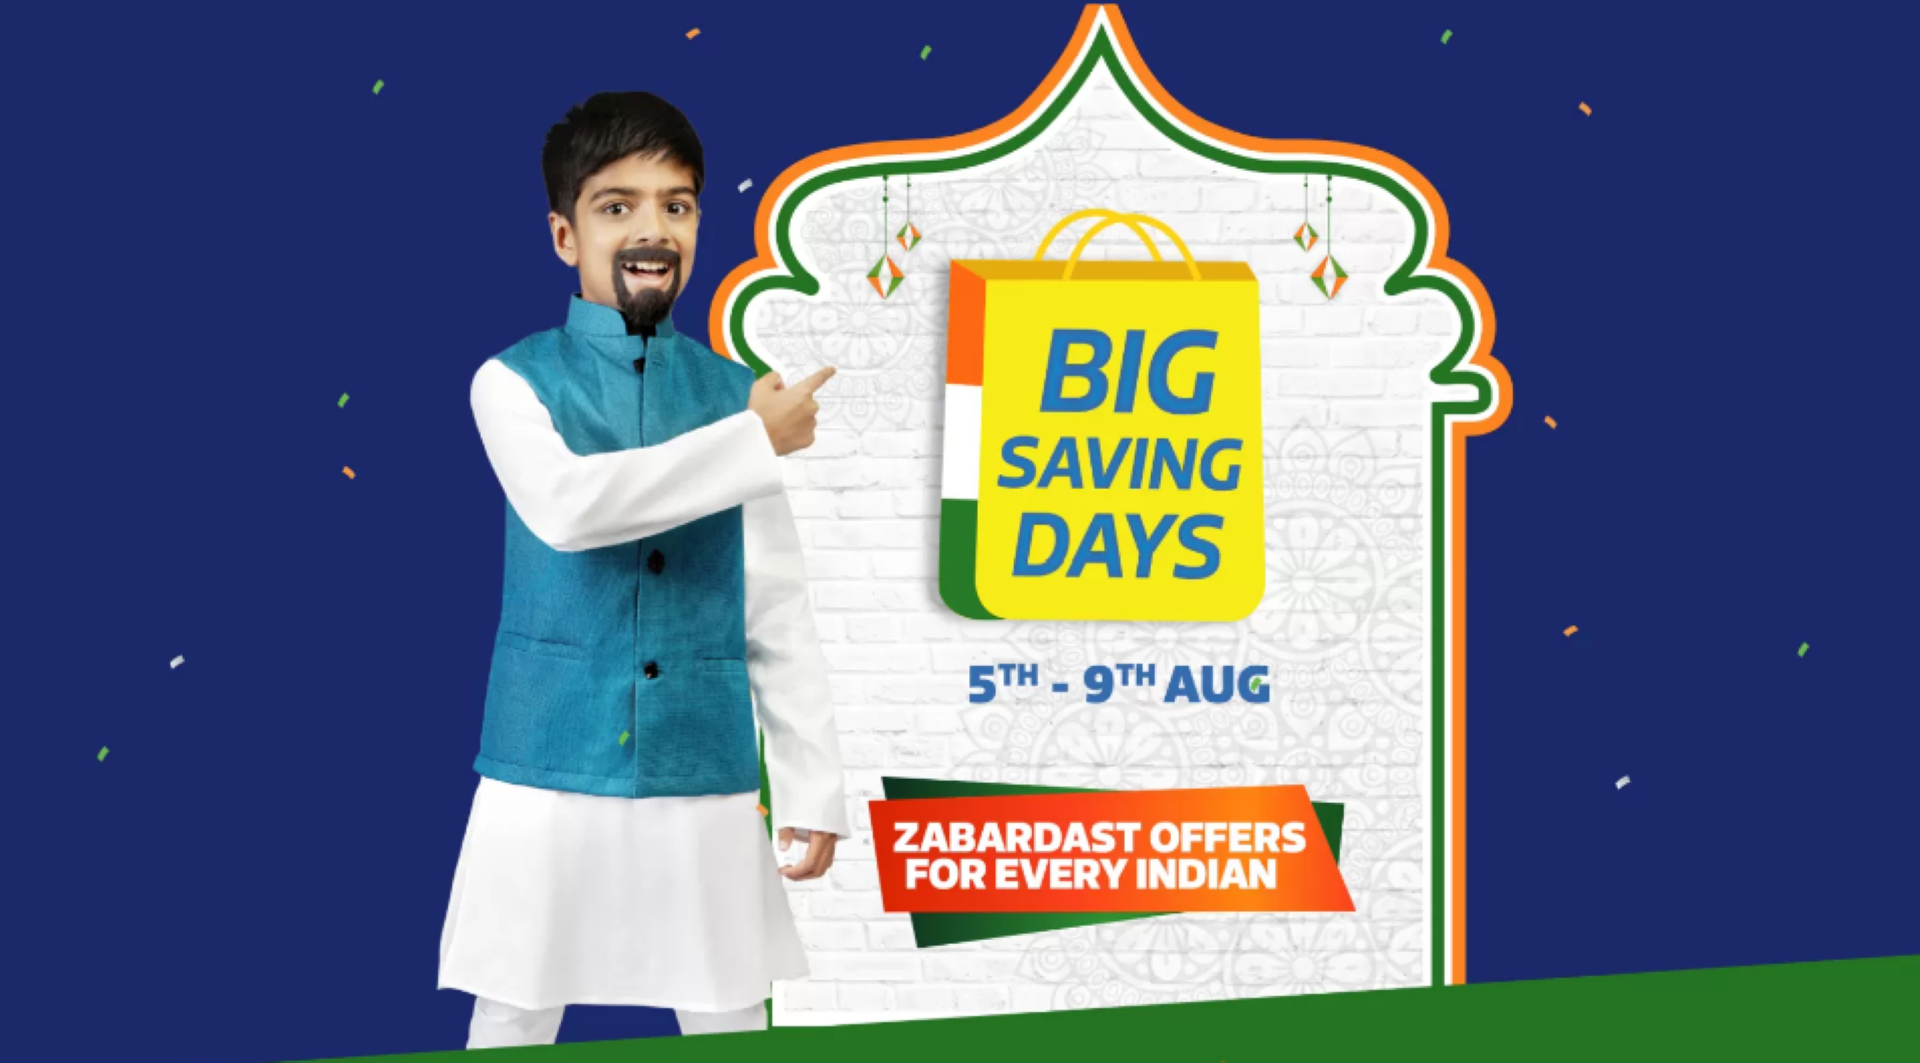 Flipkart Big Saving Days Sale Banner Image